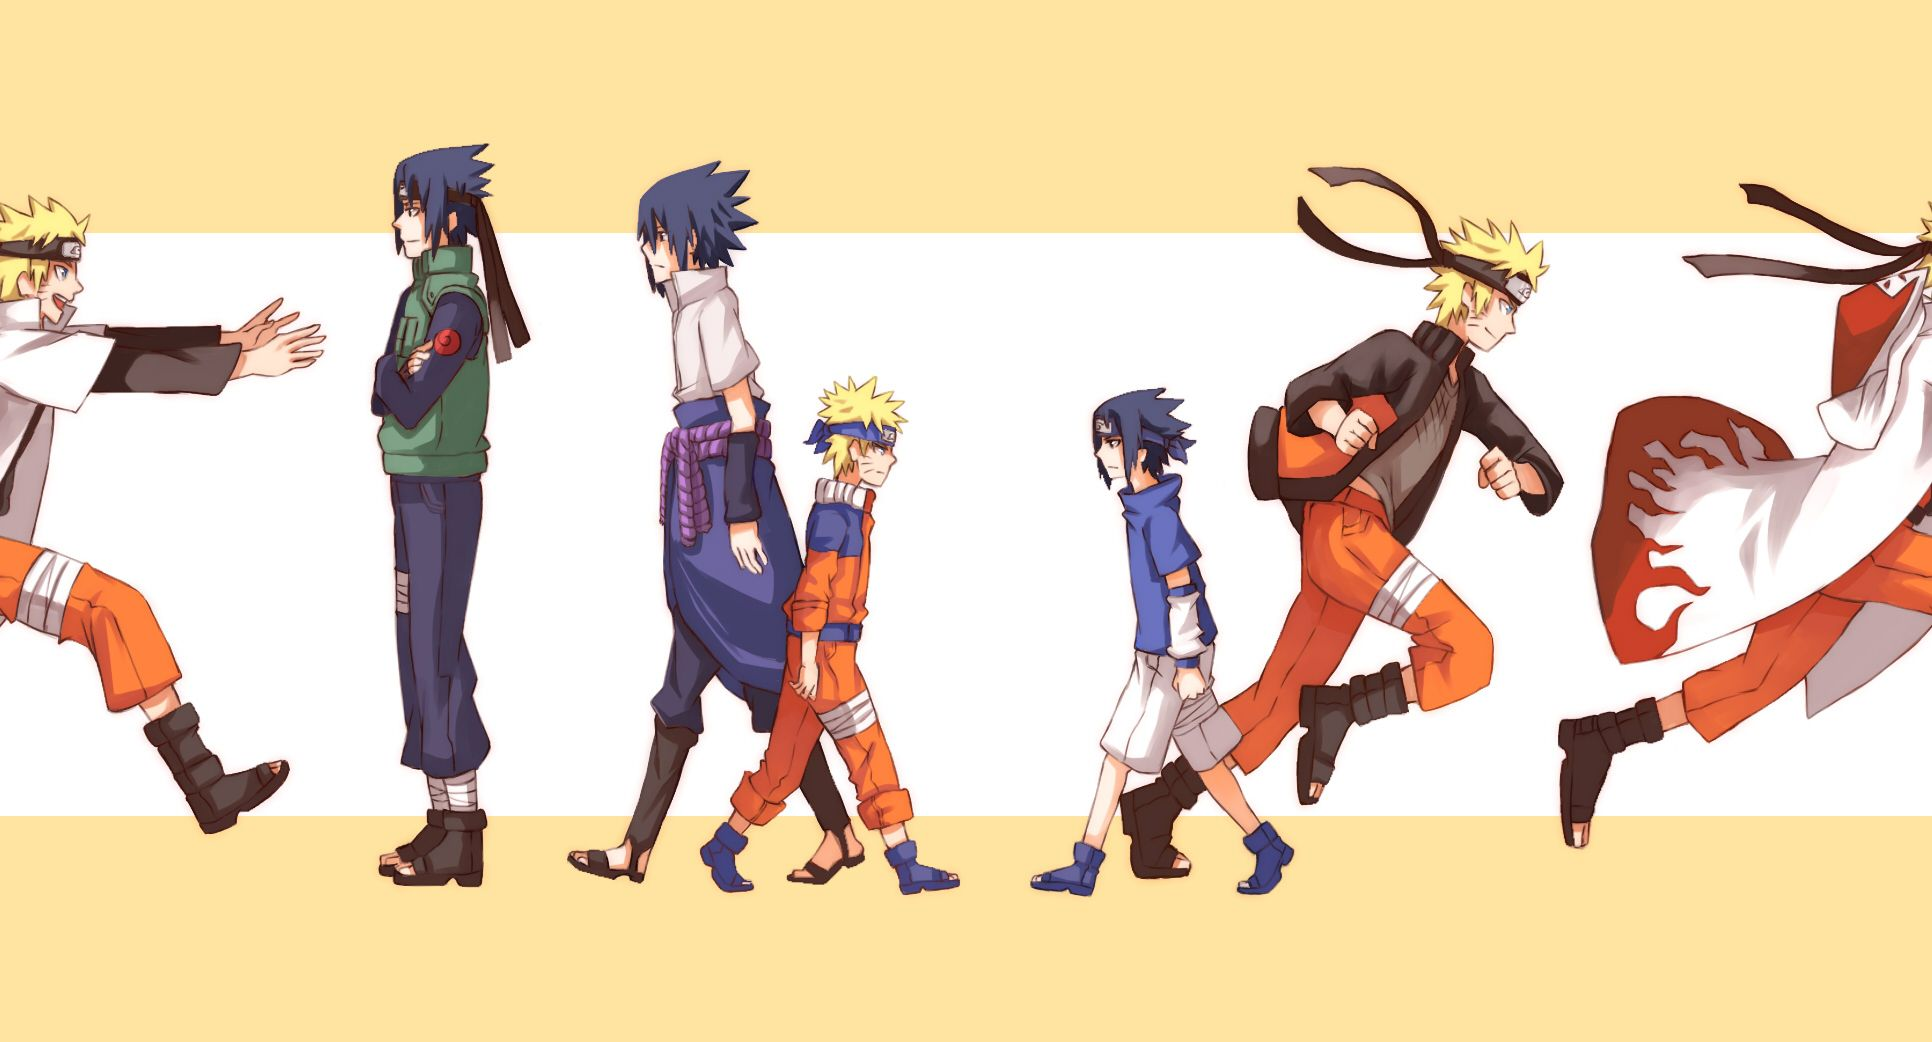 Pin by andrea gonz lez on naruto sasunaru japon - Naruto boards ...